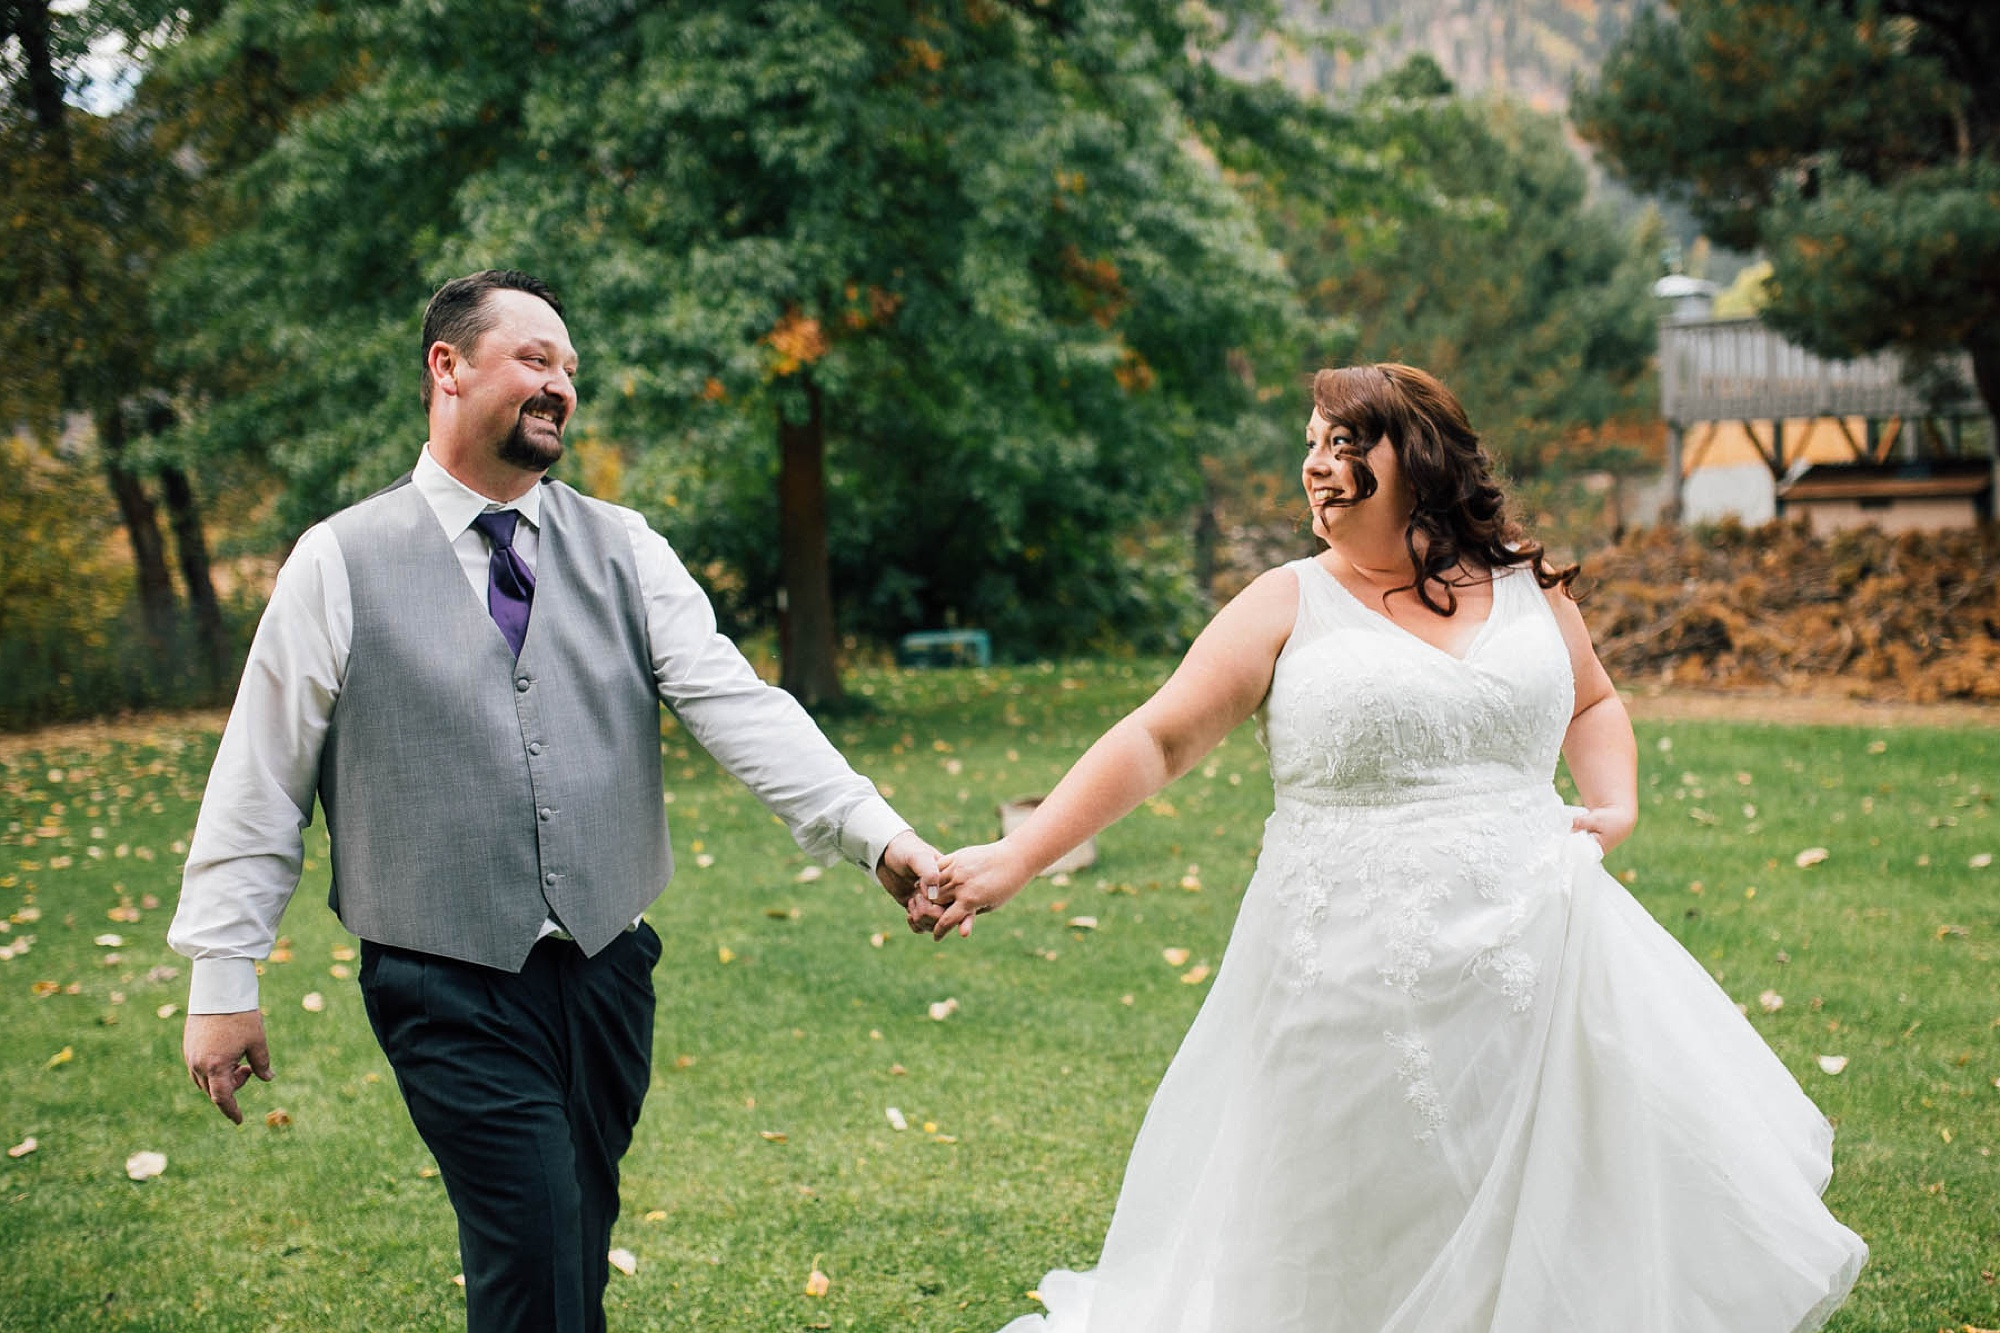 ashley_vos_seattle_ wedding_photographer_0229.jpg